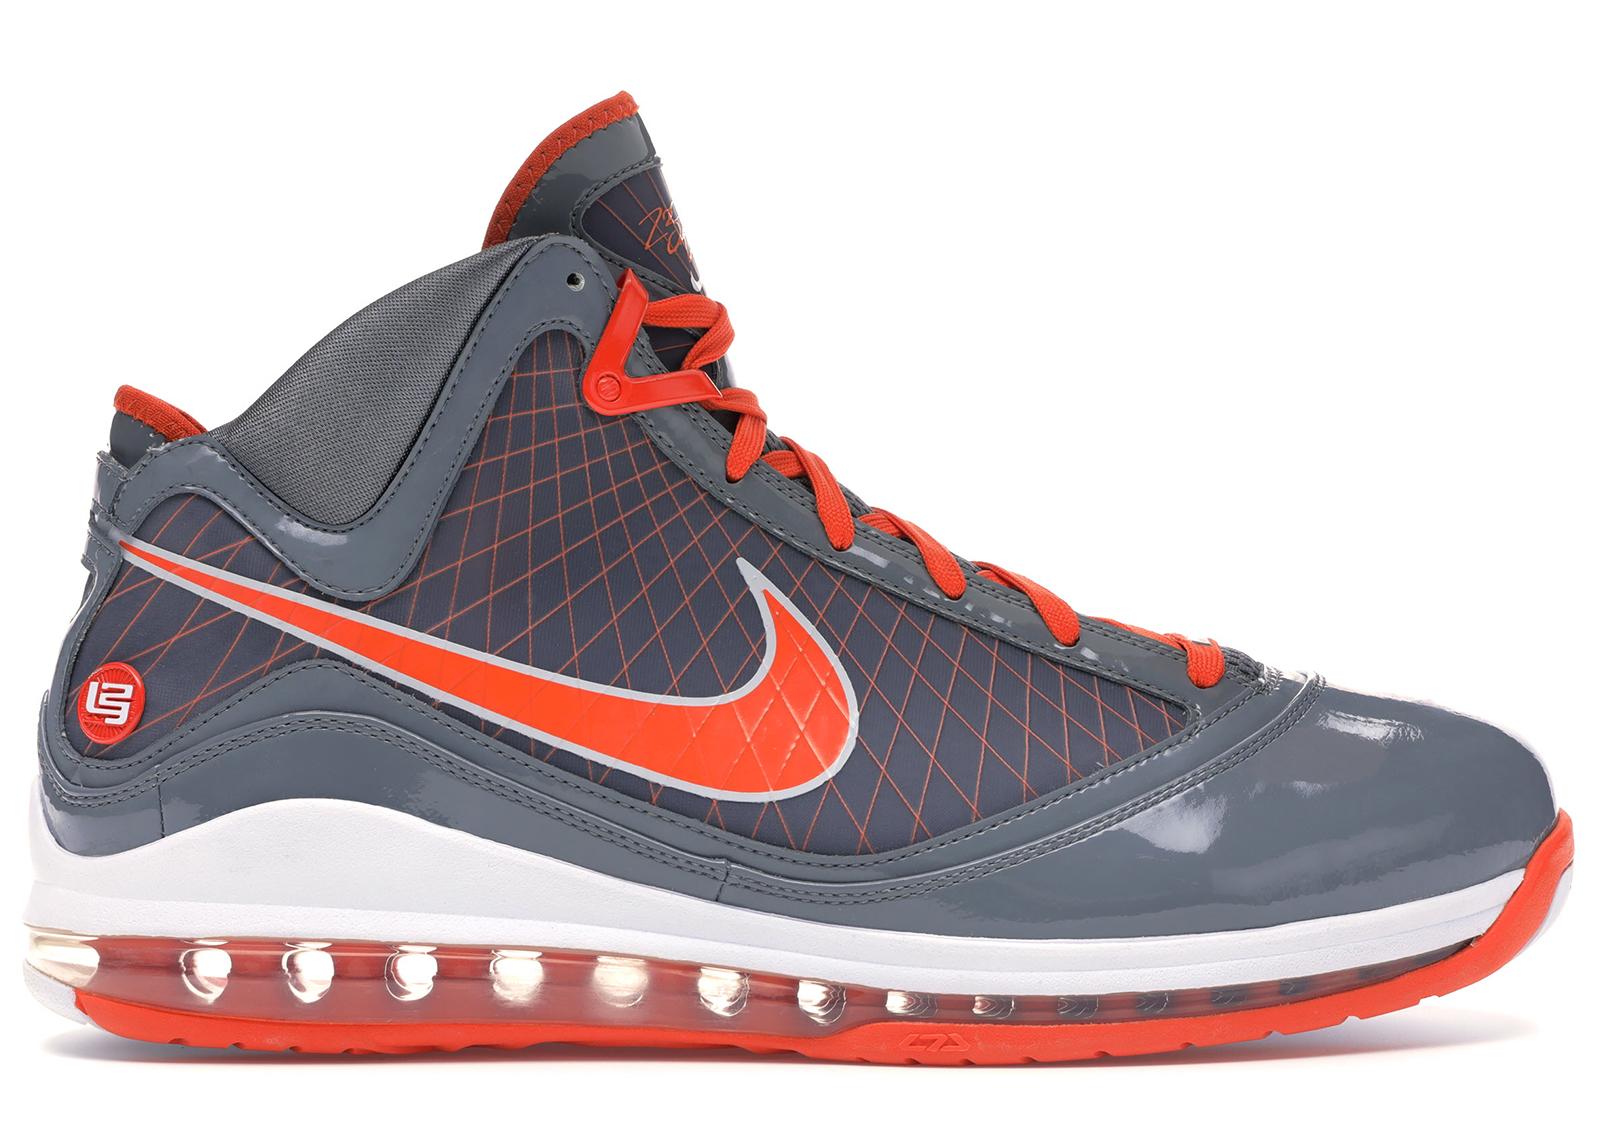 Nike LeBron 7 Eastbay TB Orange